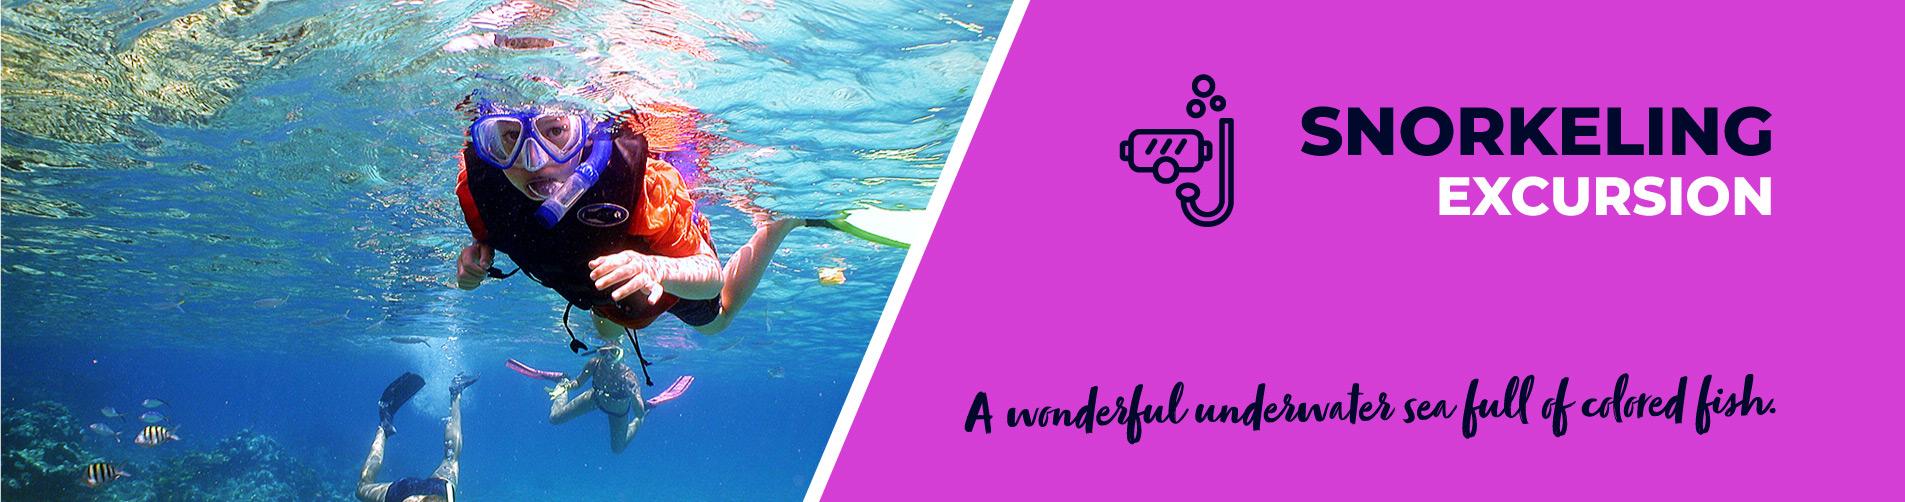 Snorkeling Excursion Punta Cana - Slide